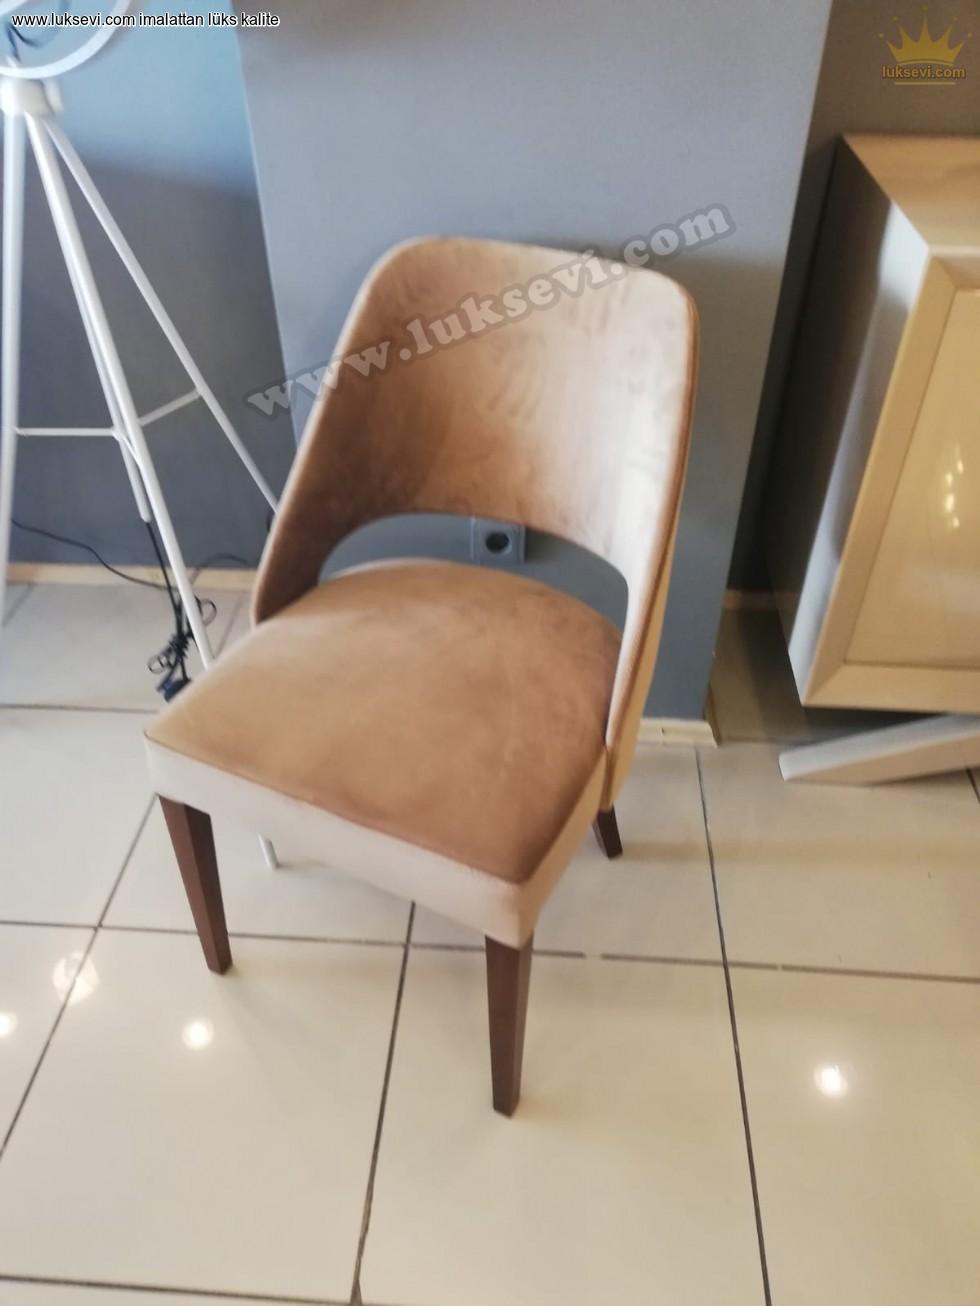 Resim No:6852 - Kavisli Modern Sandalye Modeli